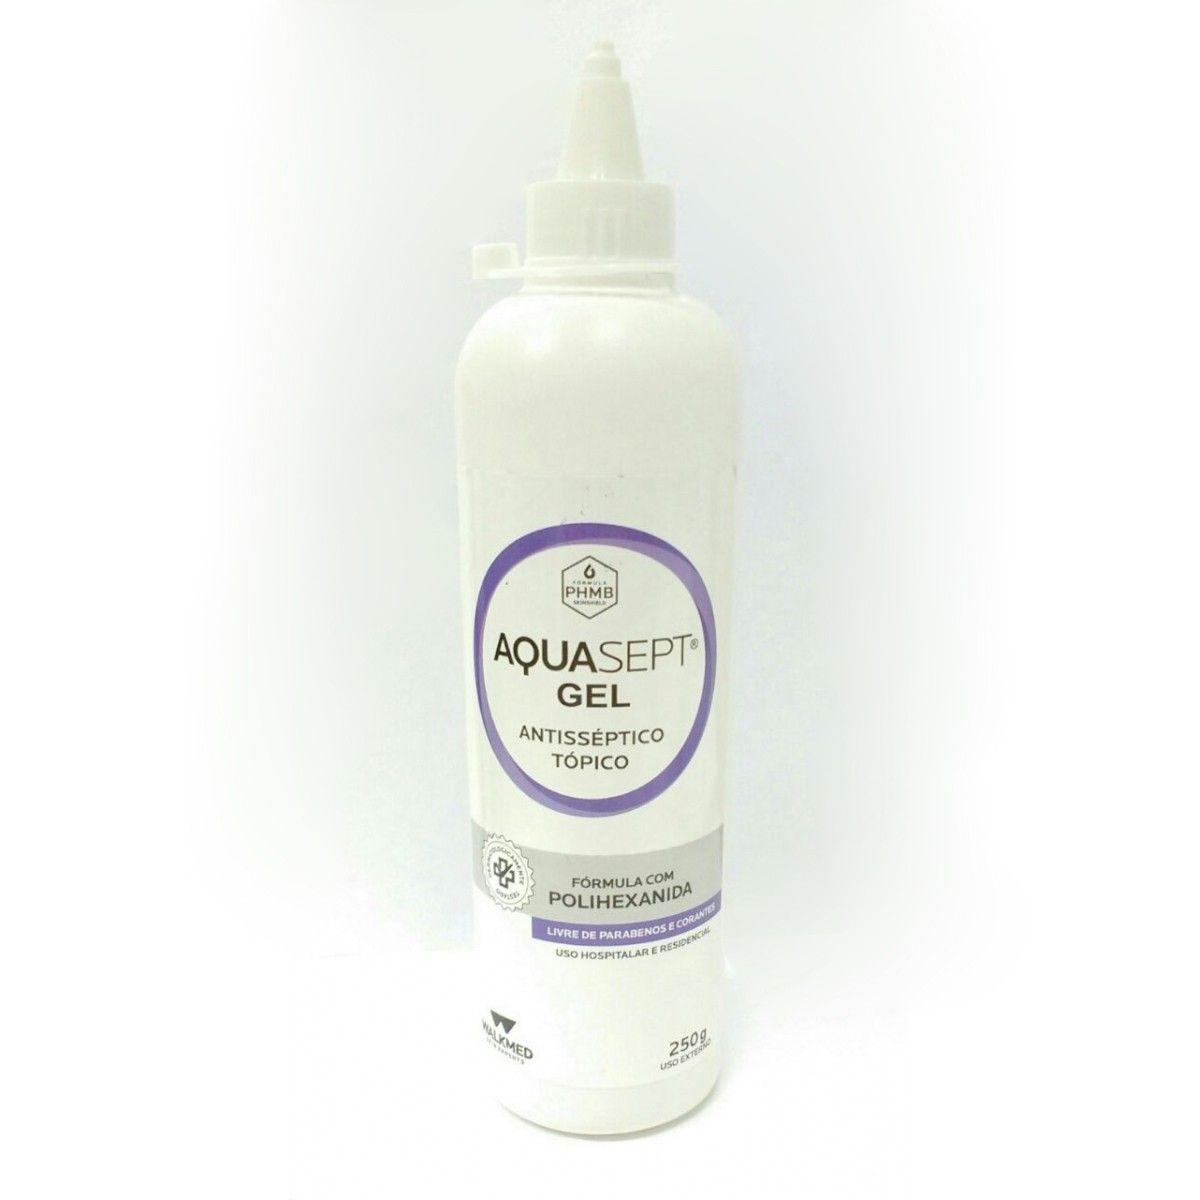 AquaSept Gel C/Fórmula Polihexanida 250G - WALKMED